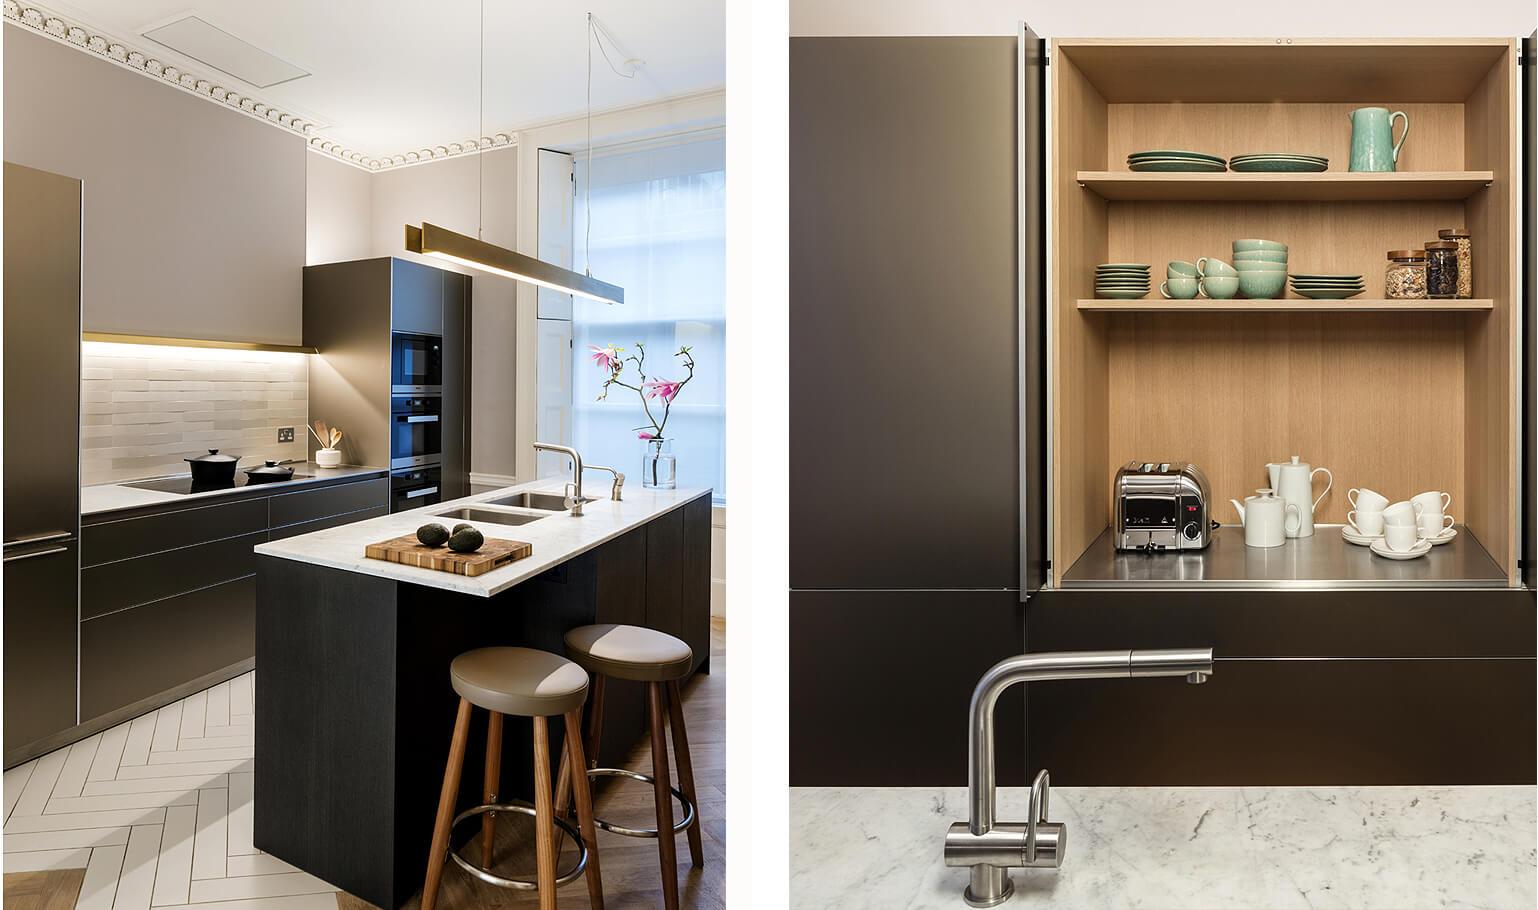 Emily_Bizley_Interior_Design_London_House_4.jpg